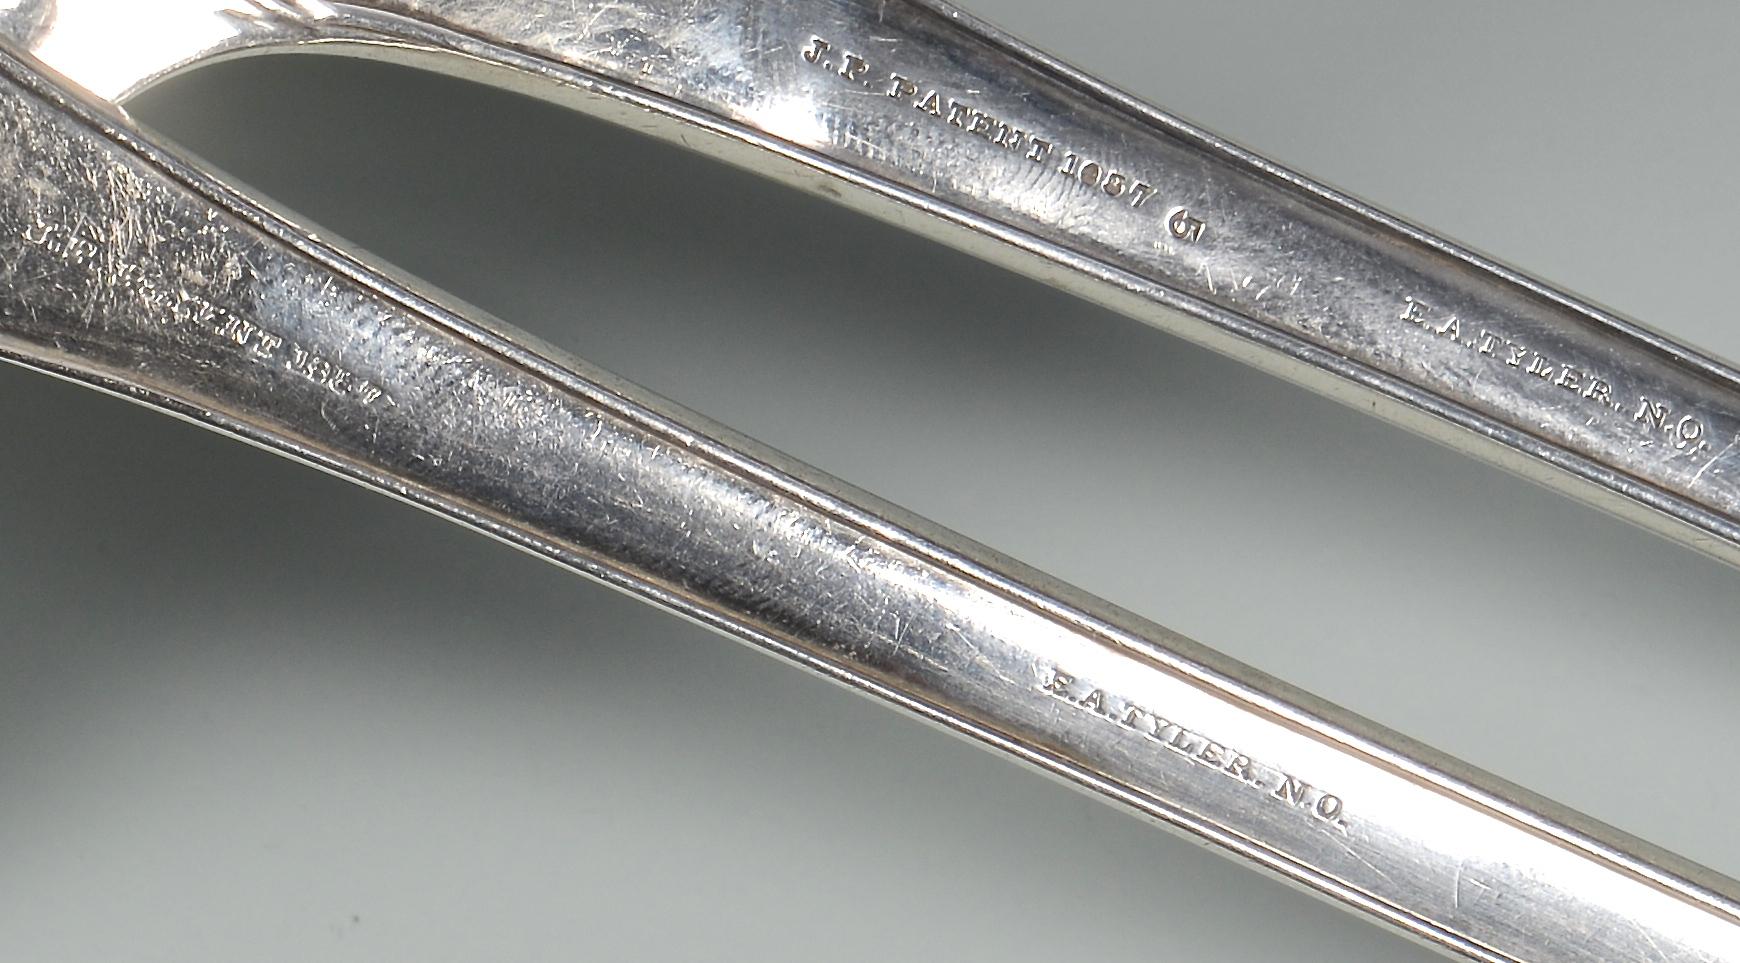 Lot 87: 2 E.A. Tyler Coin Silver Ladles, Empire pattern